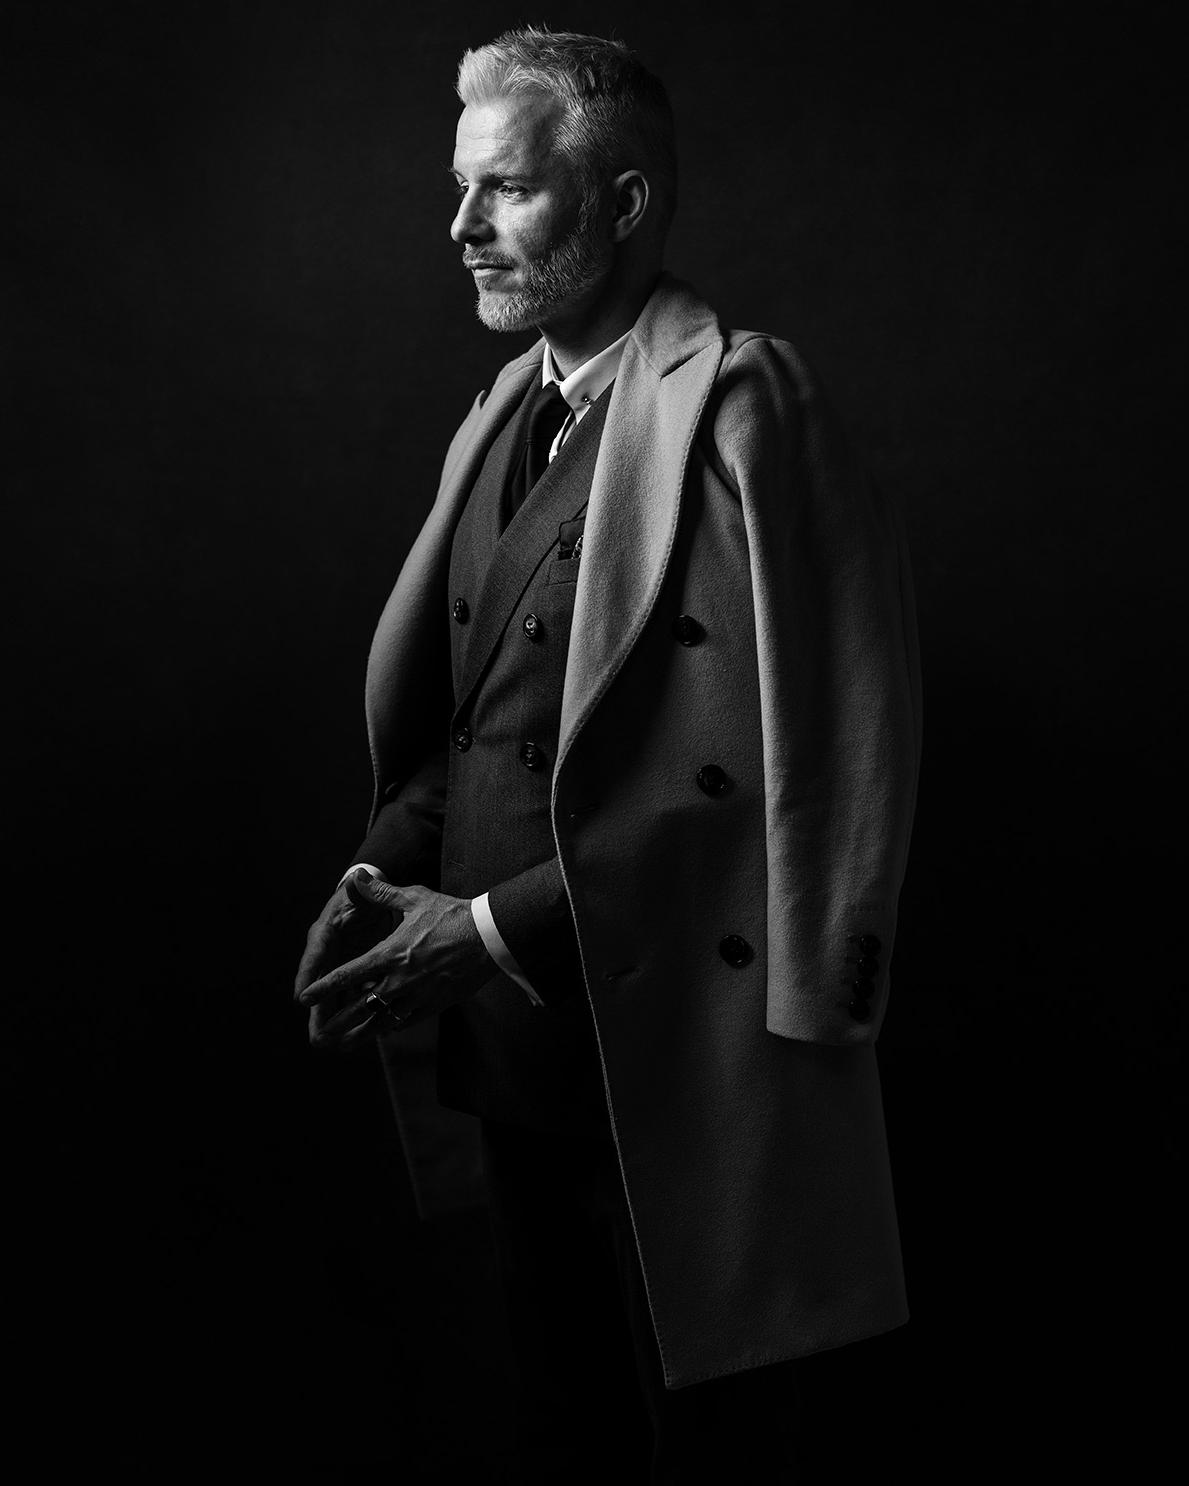 Arno Kantelberg by Frank Ruiter.